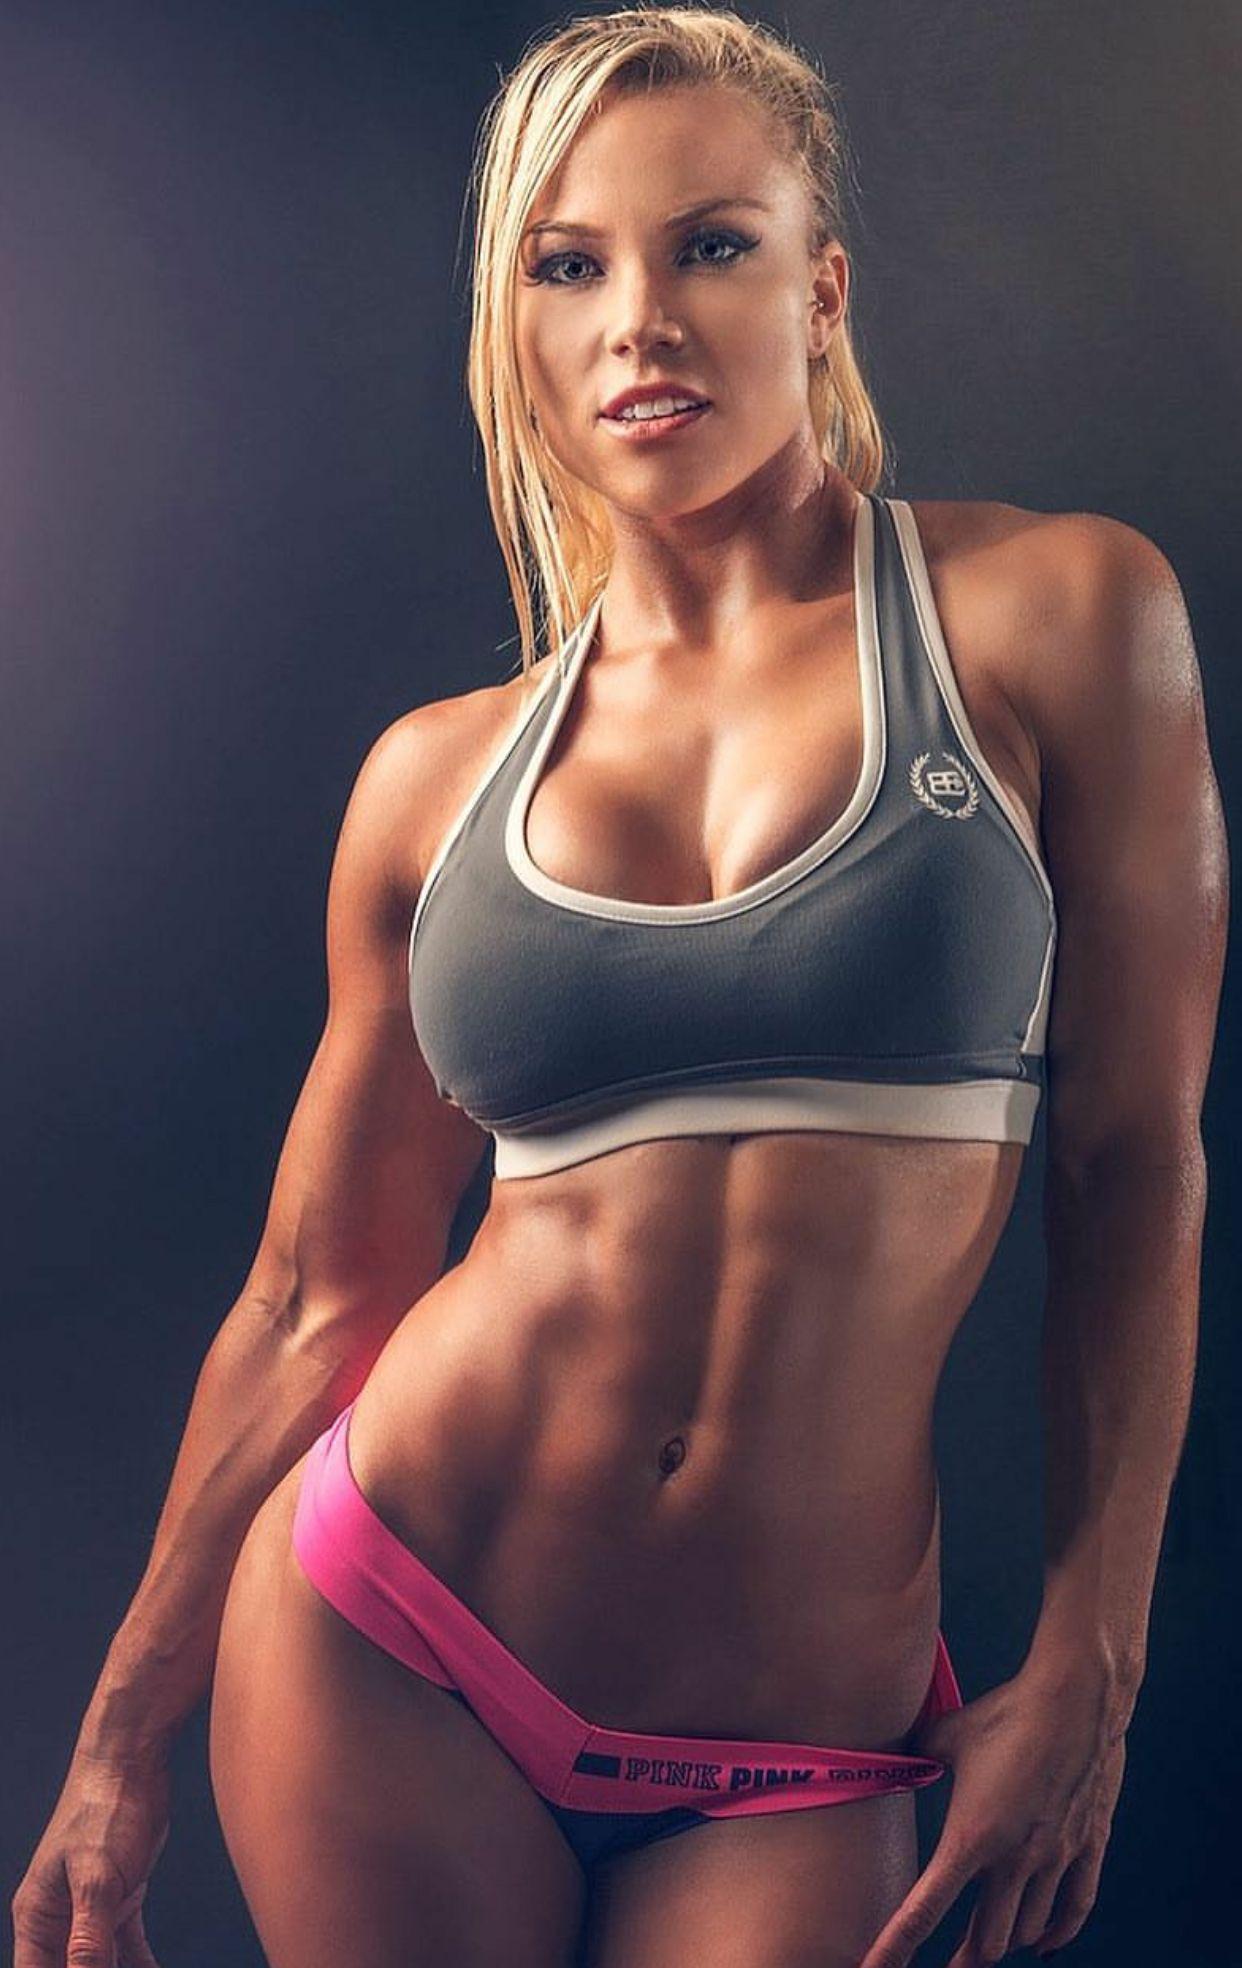 Hot Sexy Sport Girl By Alex Sparrow